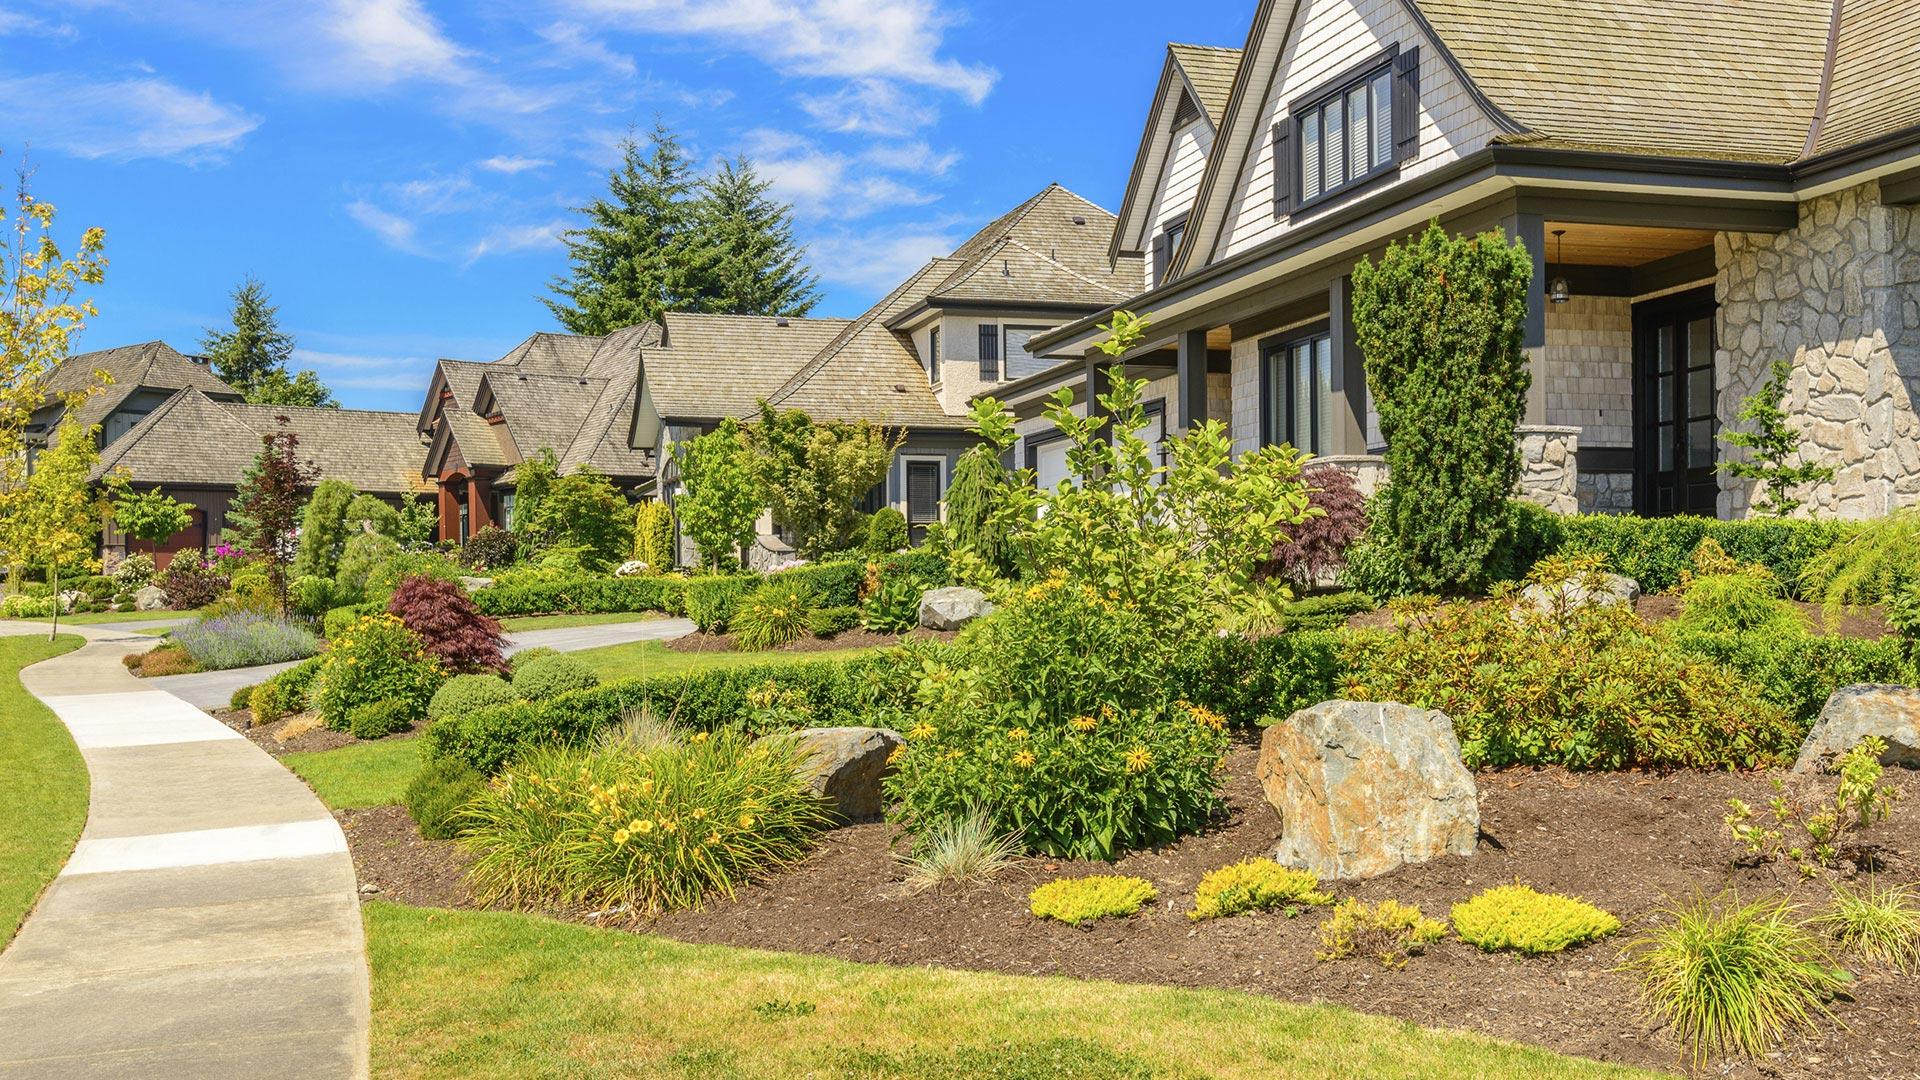 Novell Landscape Service Landscaping, Lawn Maintenance and Hardscaping slide 2